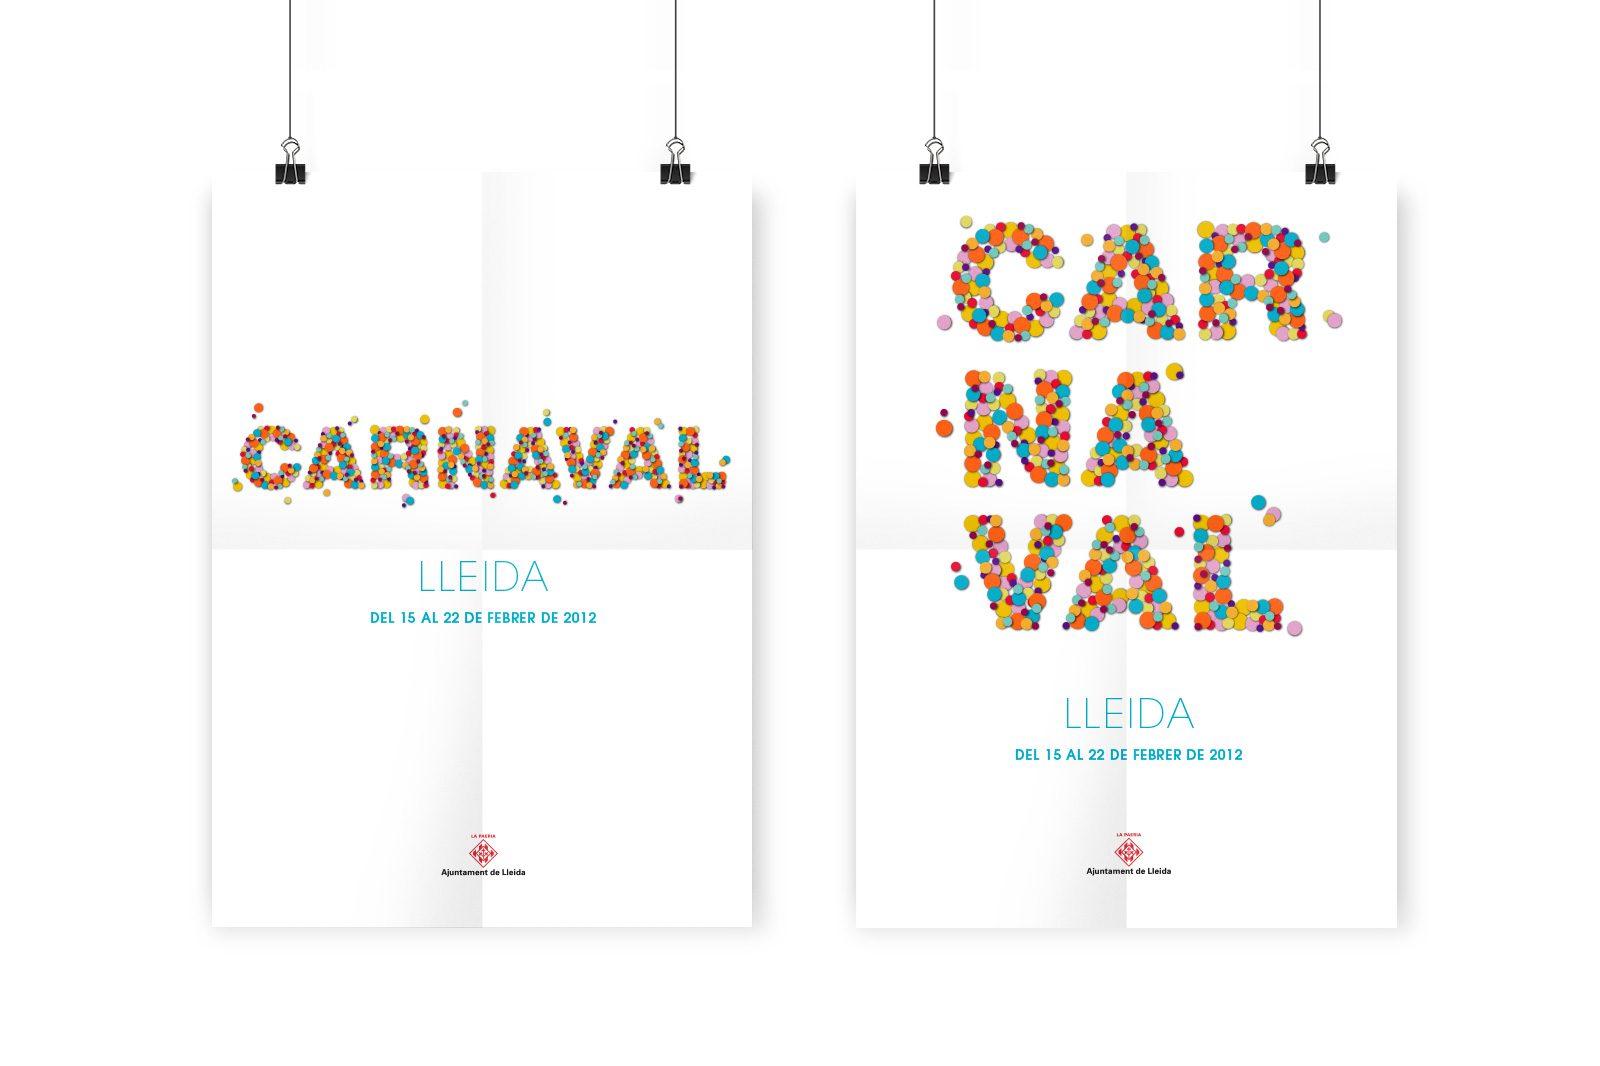 carnaval-lleida-1